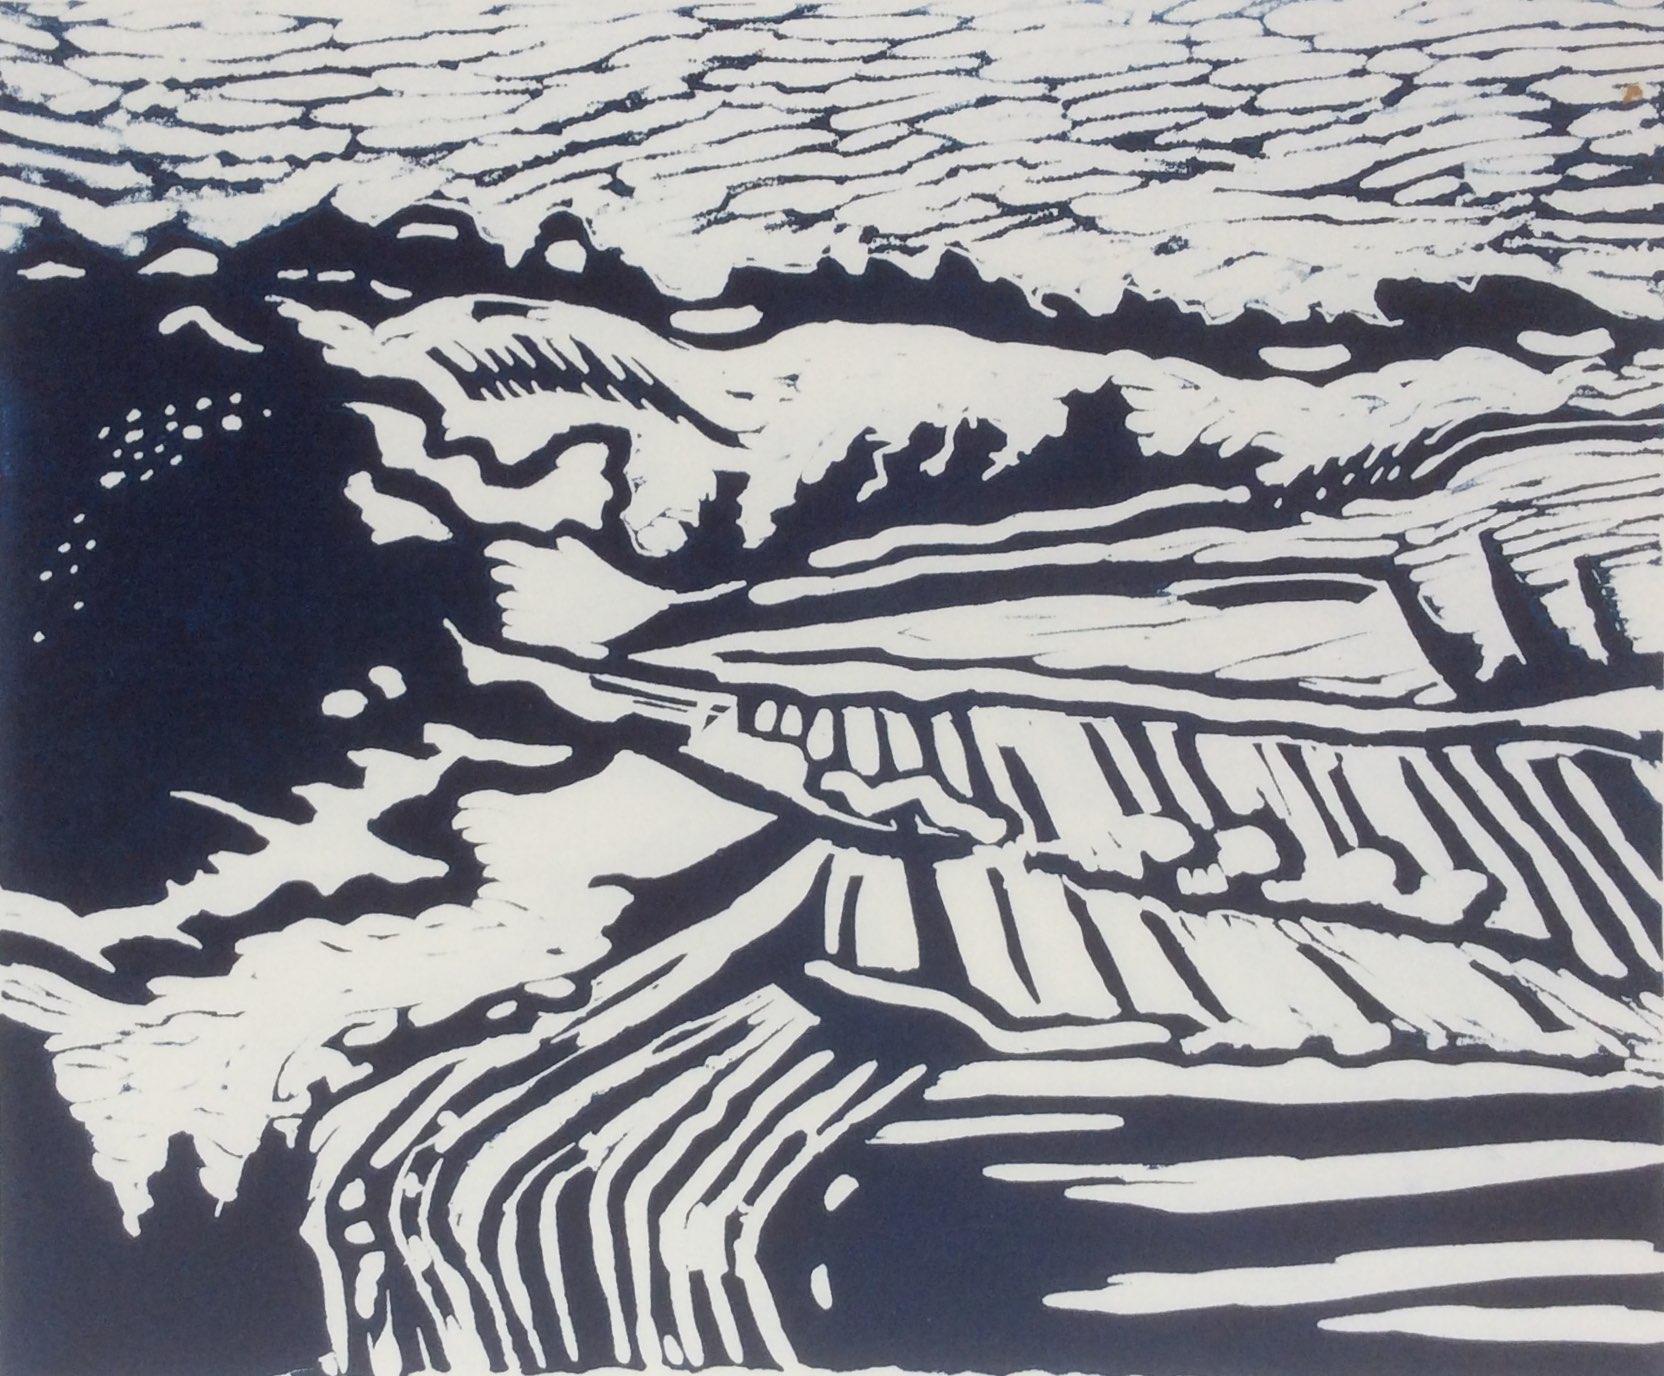 Fyfield Down 3 lino print 29x24